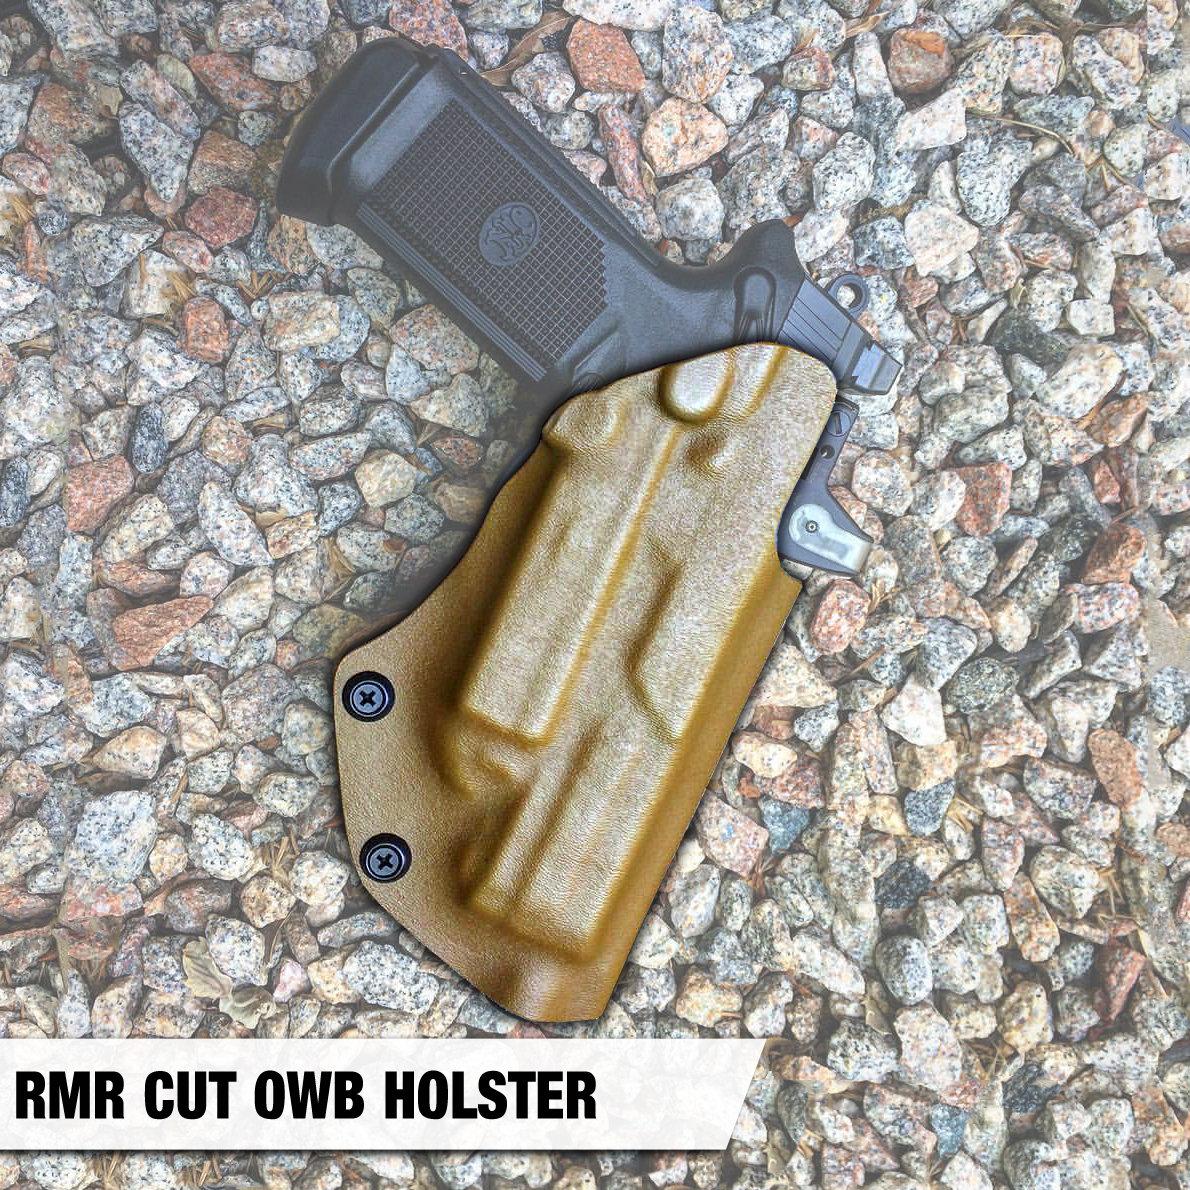 rmr, holster, rmr cut holster, owb holster, dara holsters, fnx 45 holster,